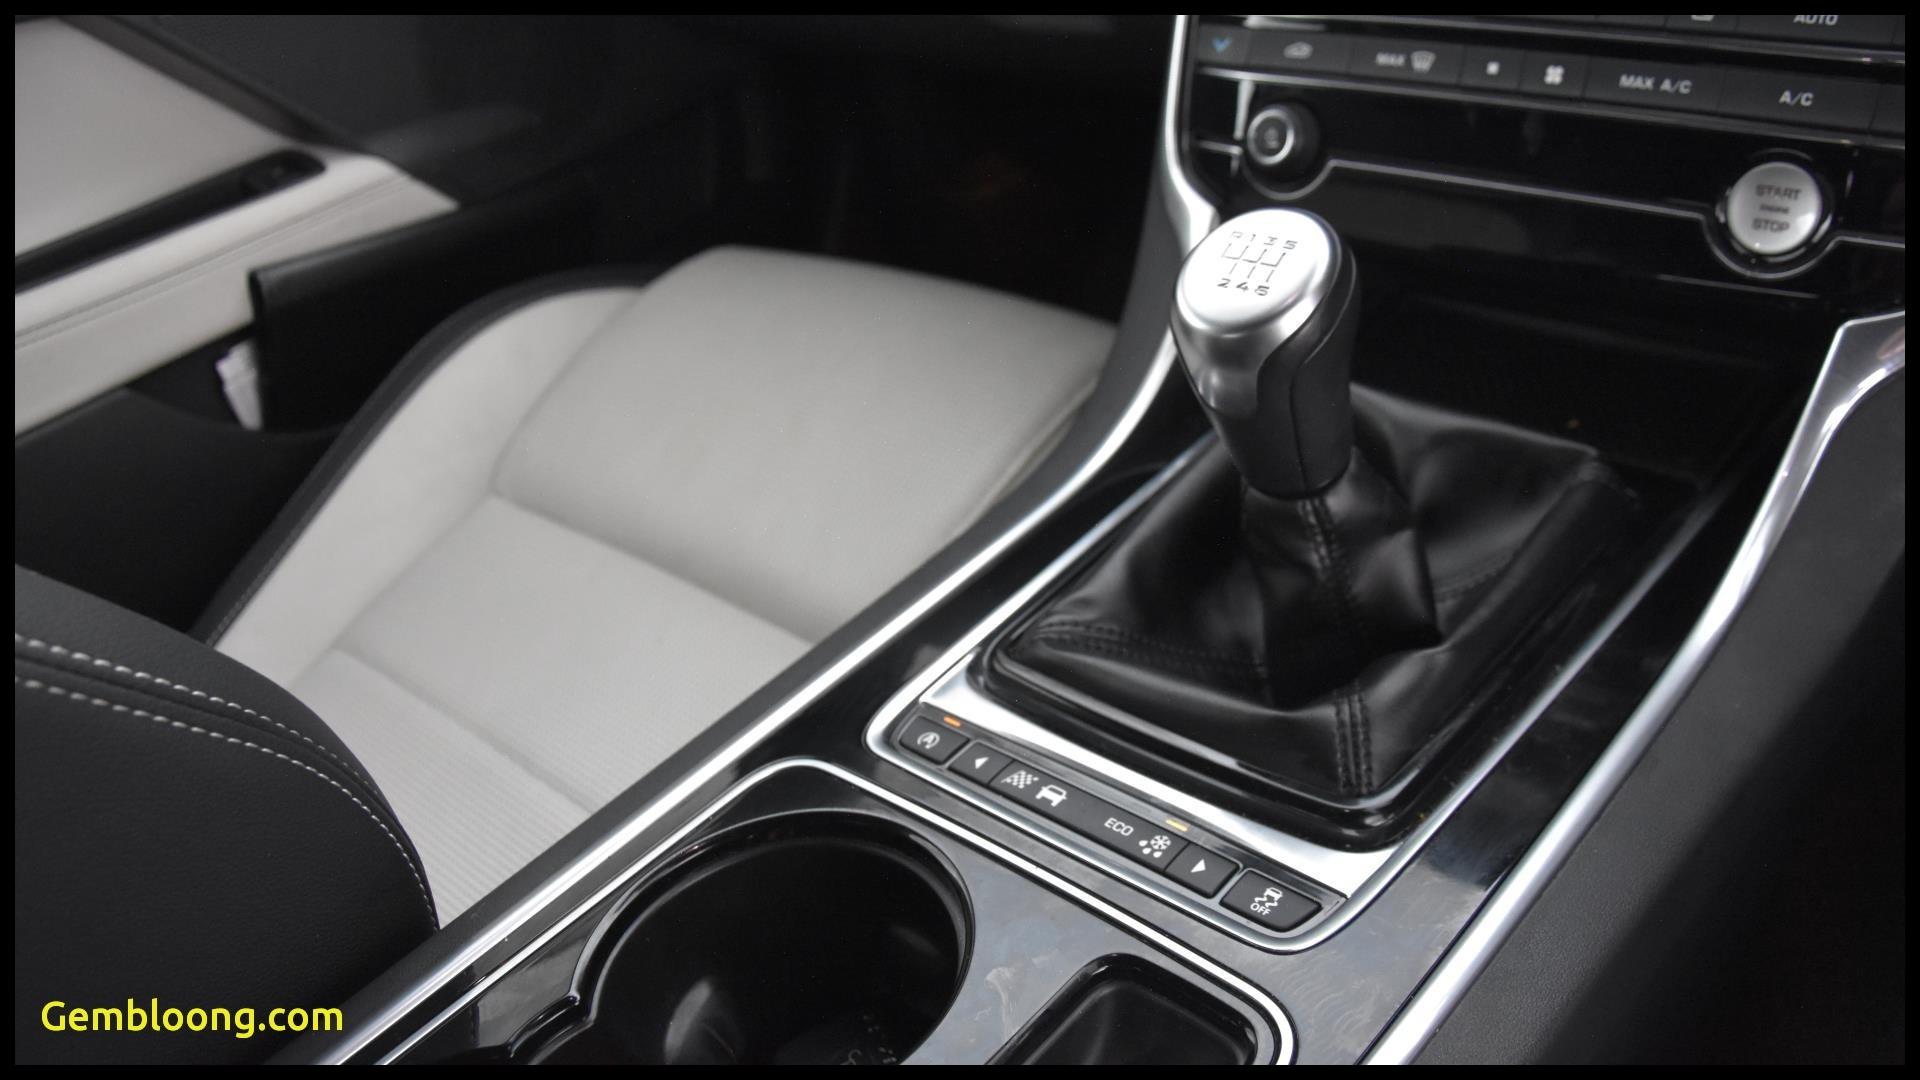 Az Used Cars Inspirational Nearest Car Dealership Luxury Used Car Dealers Elegant Used Bmw X3 3